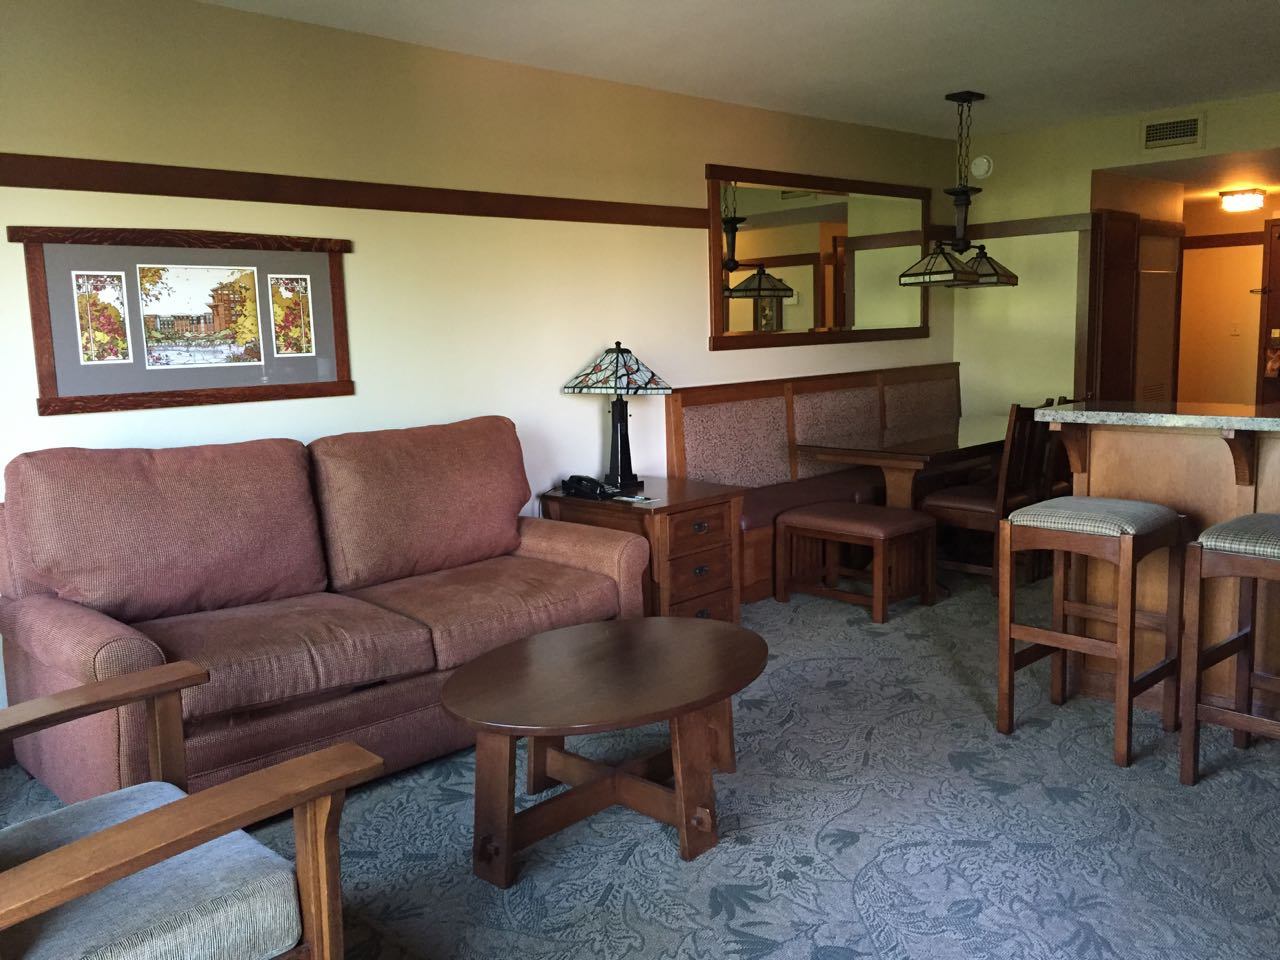 Disney's Grand Californian Hotel One Bedroom Villa Family Room